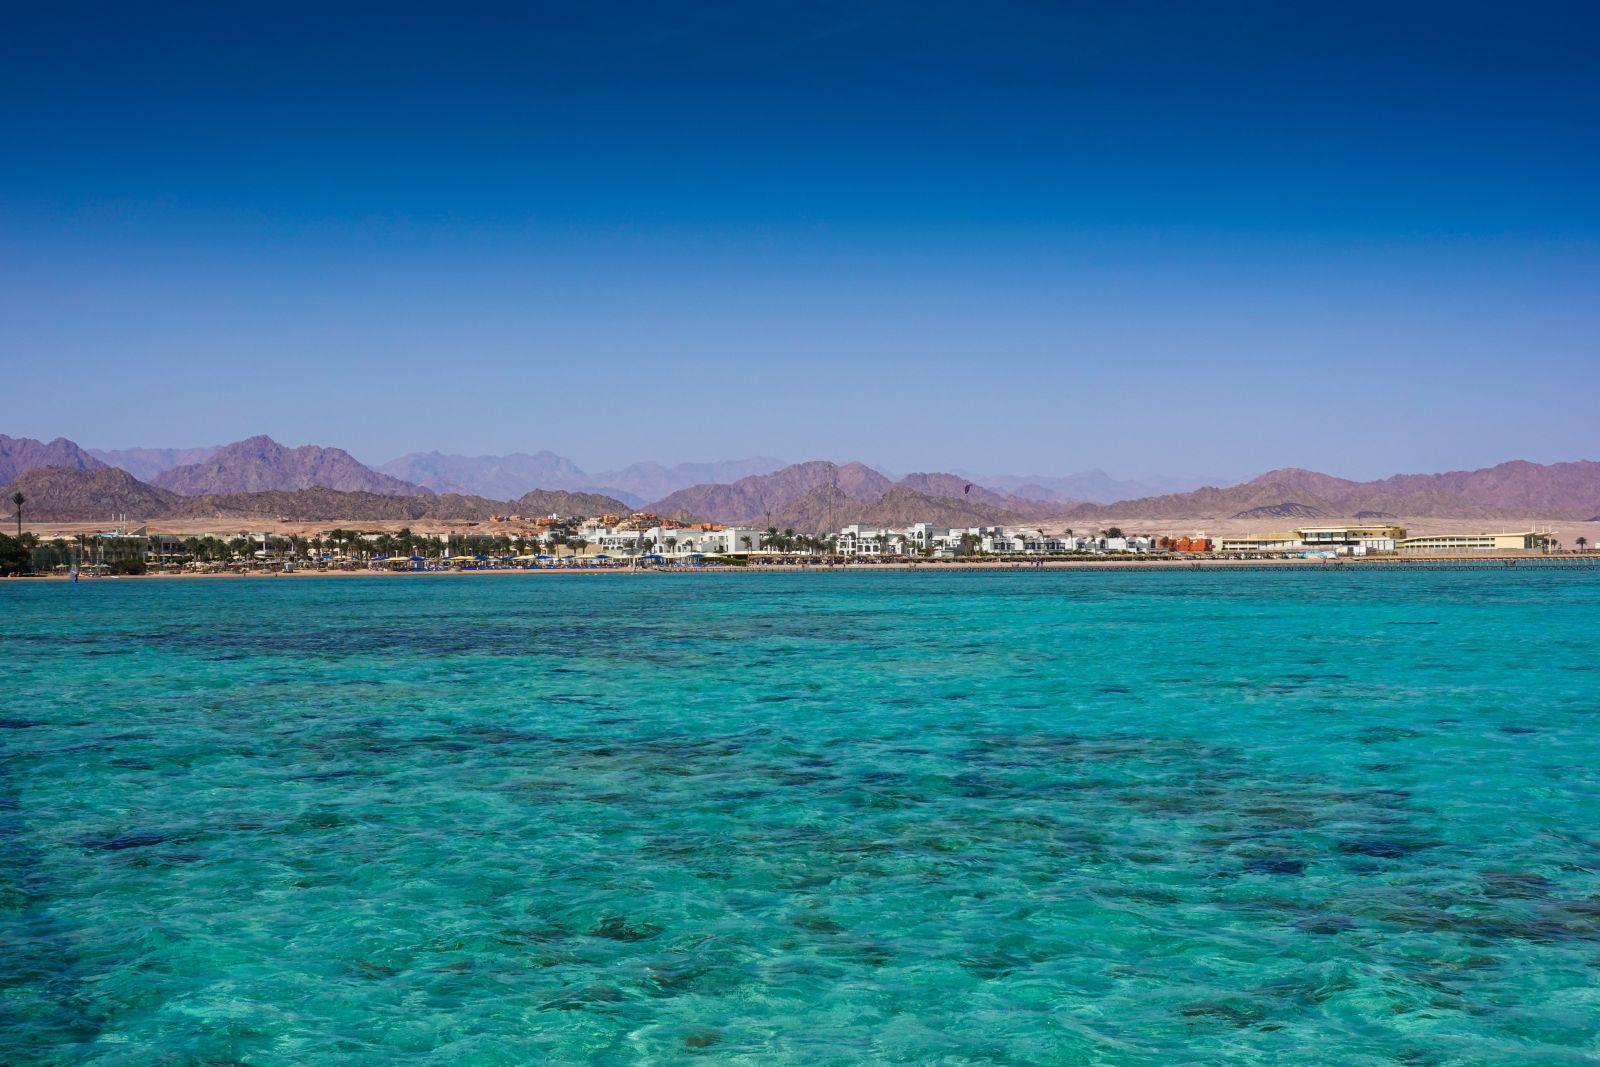 Africa, Egypt, Sharm el Sheikh